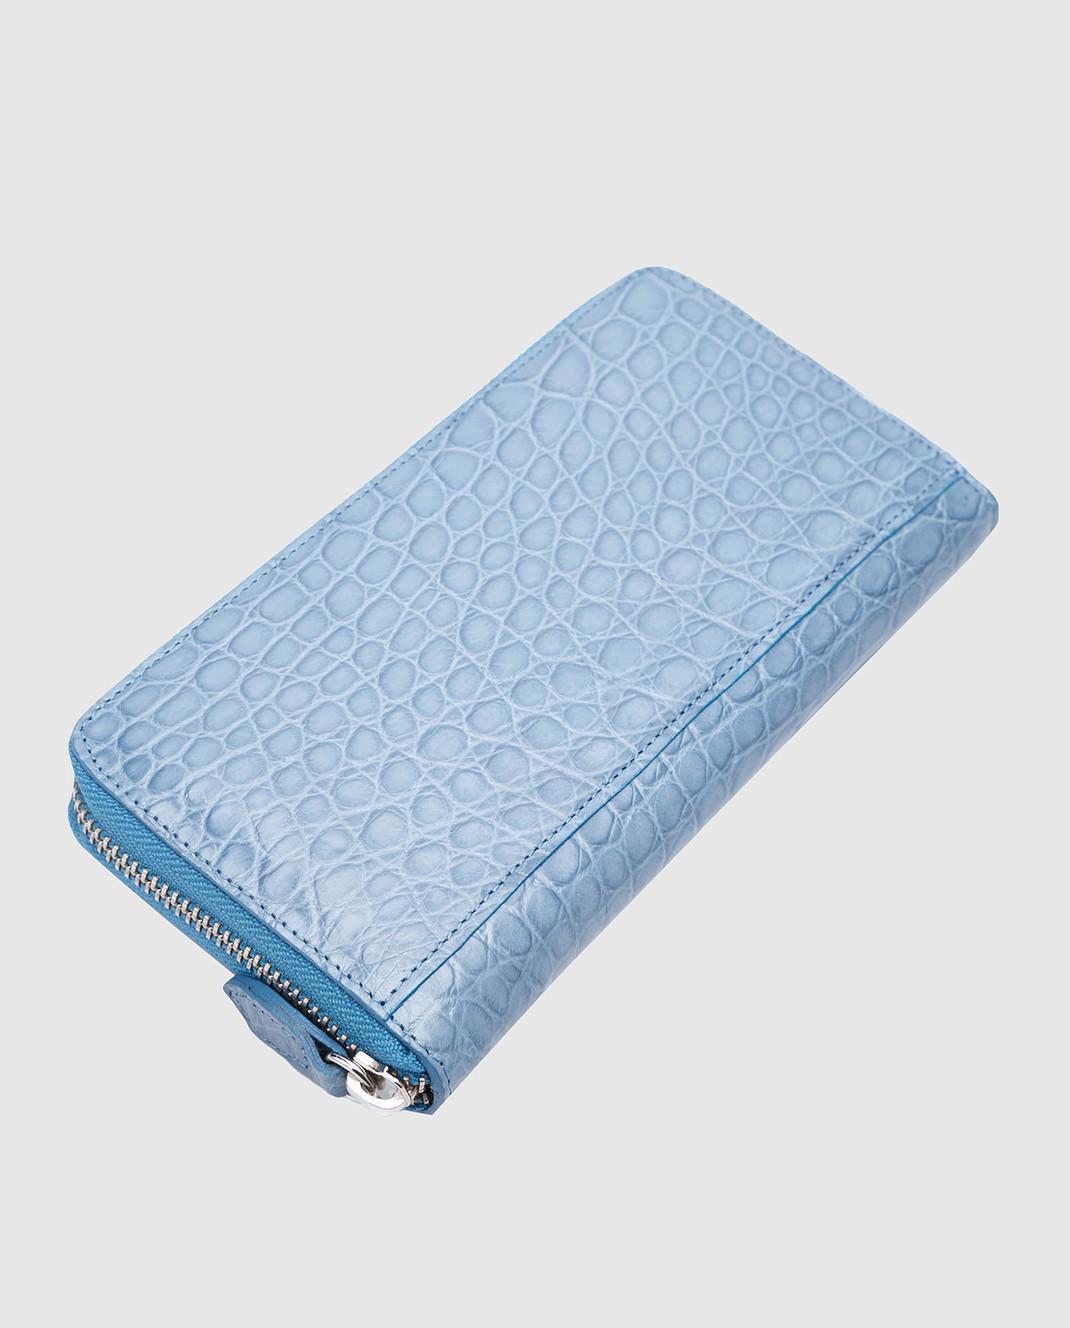 Bochicchio Голубой кожаный кошелек изображение 3